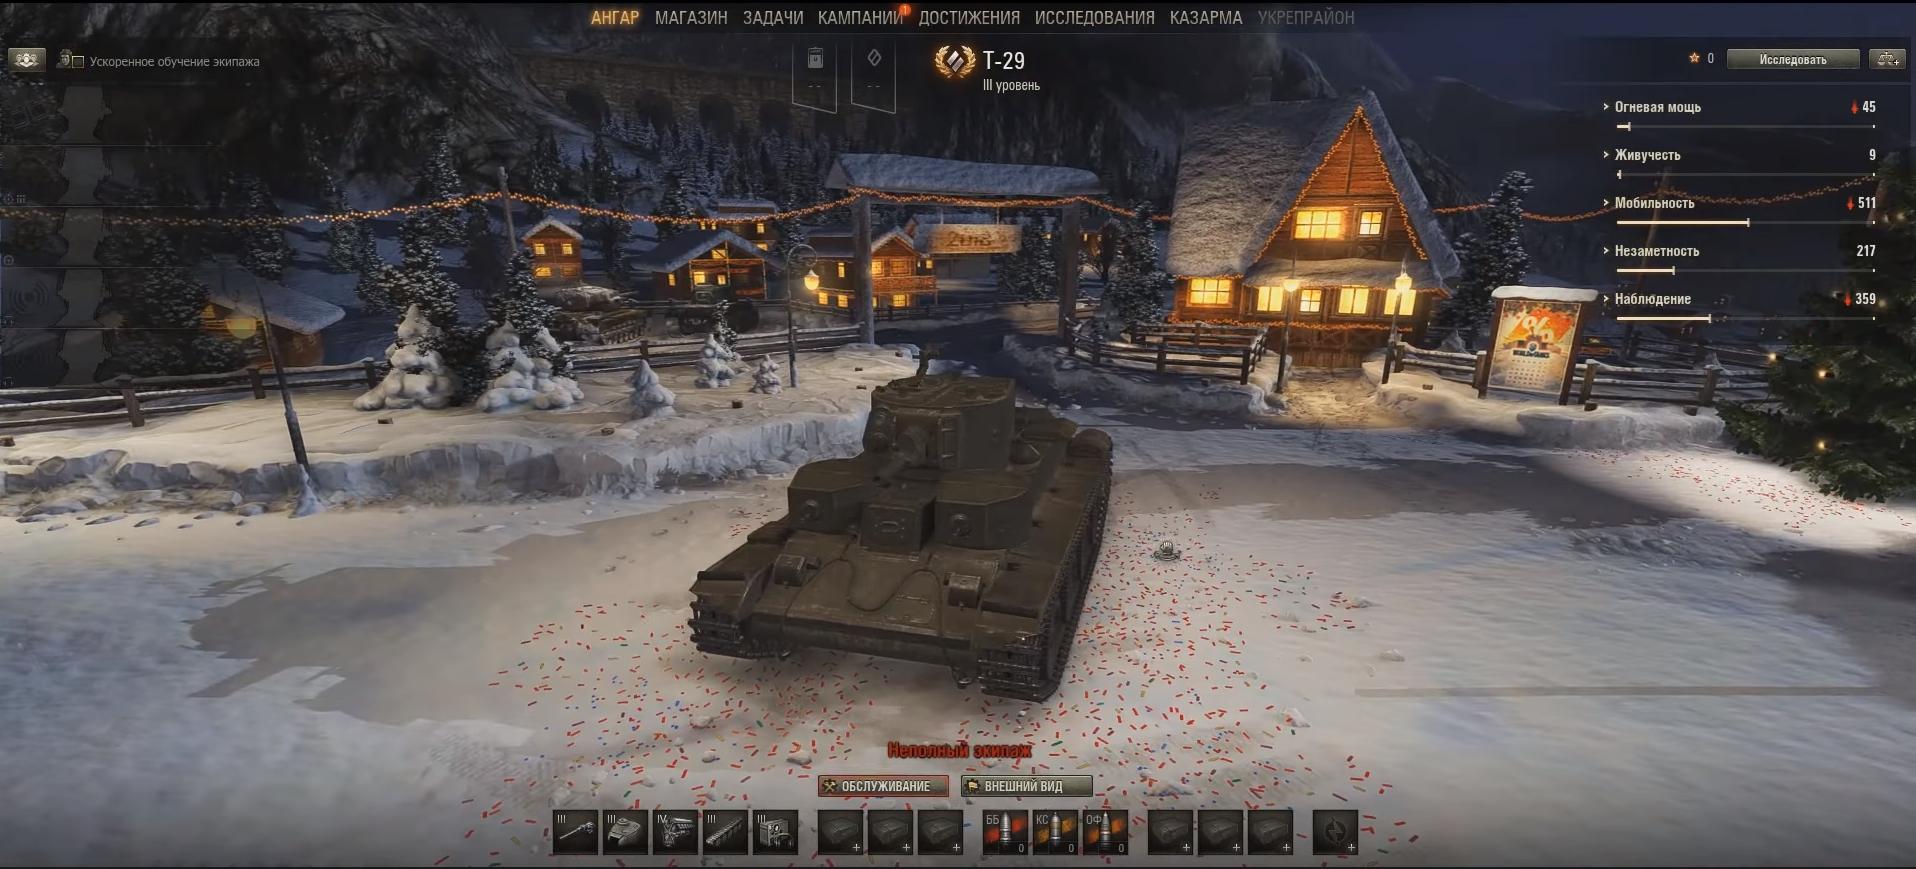 World of Tanks Бесплатная Онлайн-игра про Танки 915